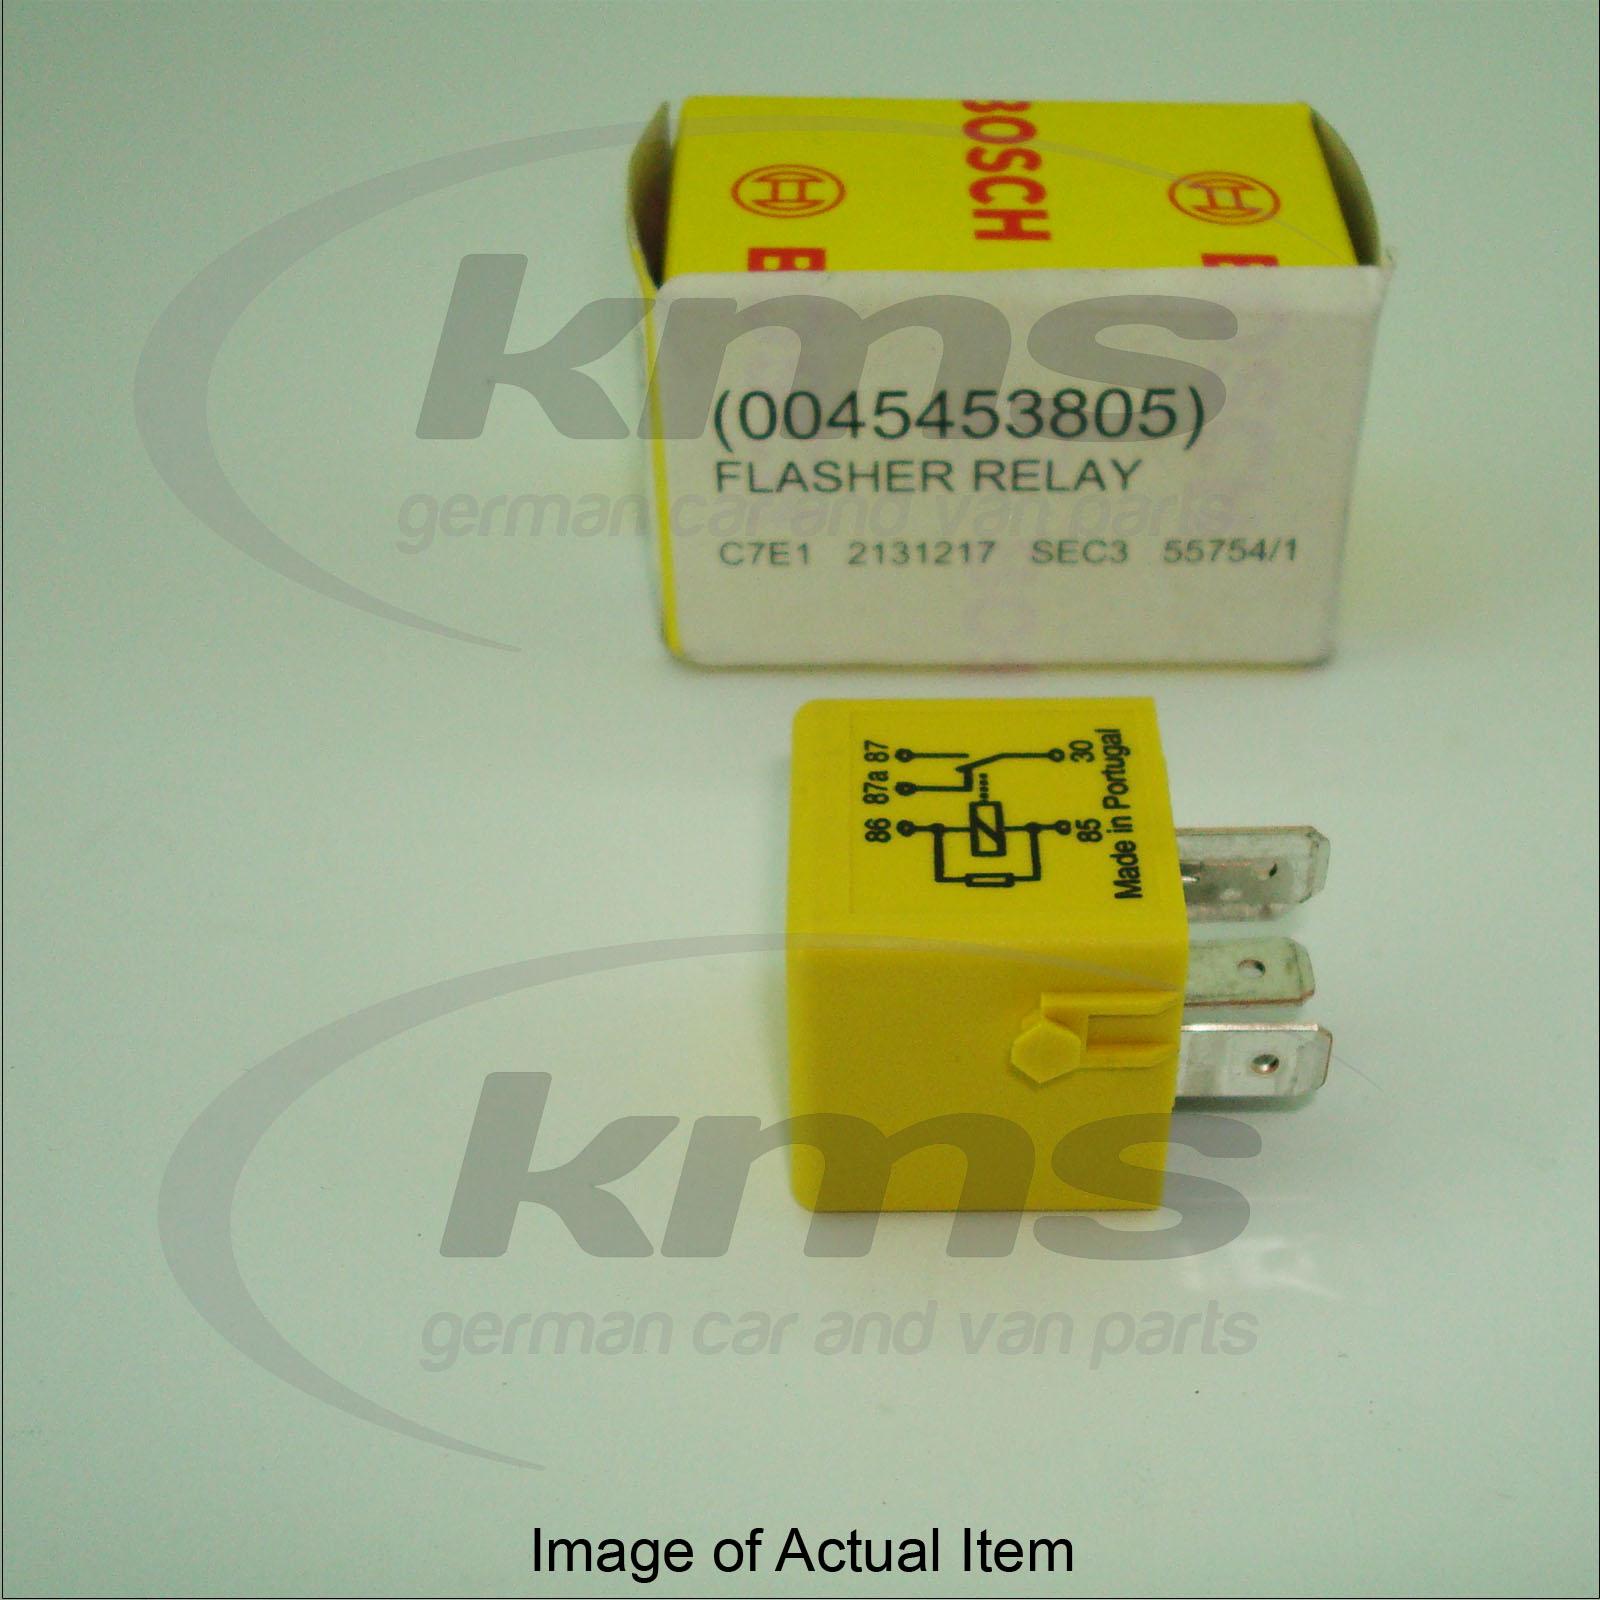 Hitachi Alternator Wiring Diagram On Nissan 720 Turn Signal Wiring